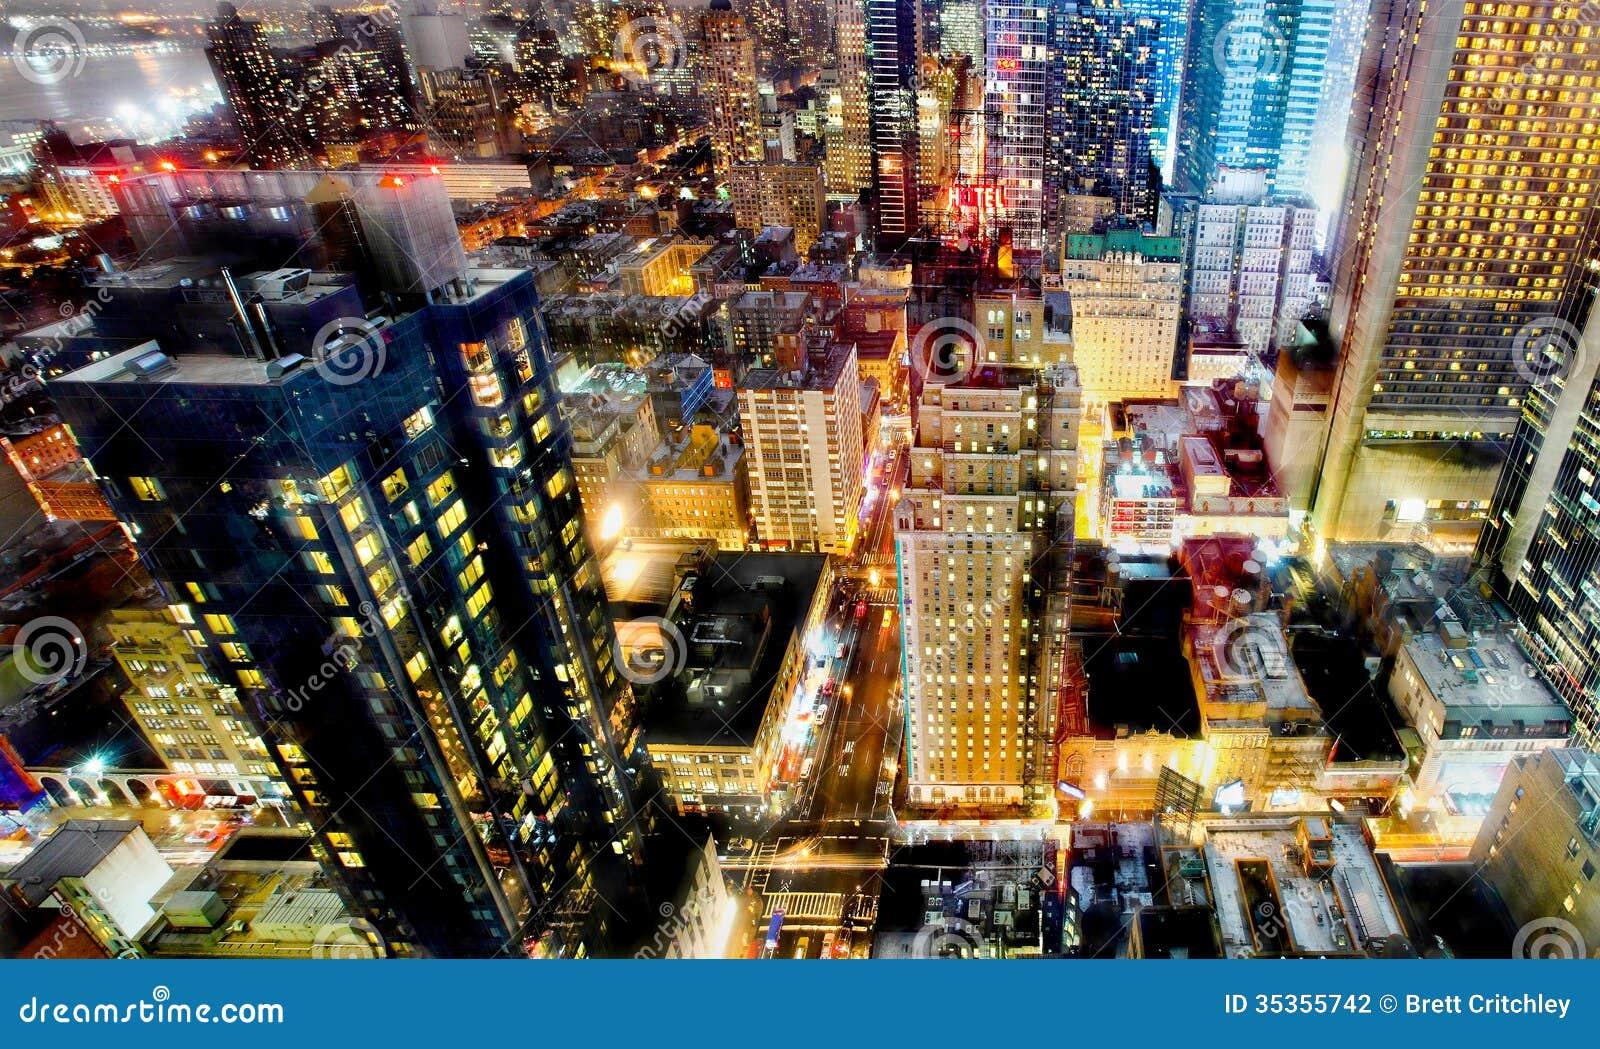 New York City Night Lights Stock Photography - Image: 35355742  New York City N...